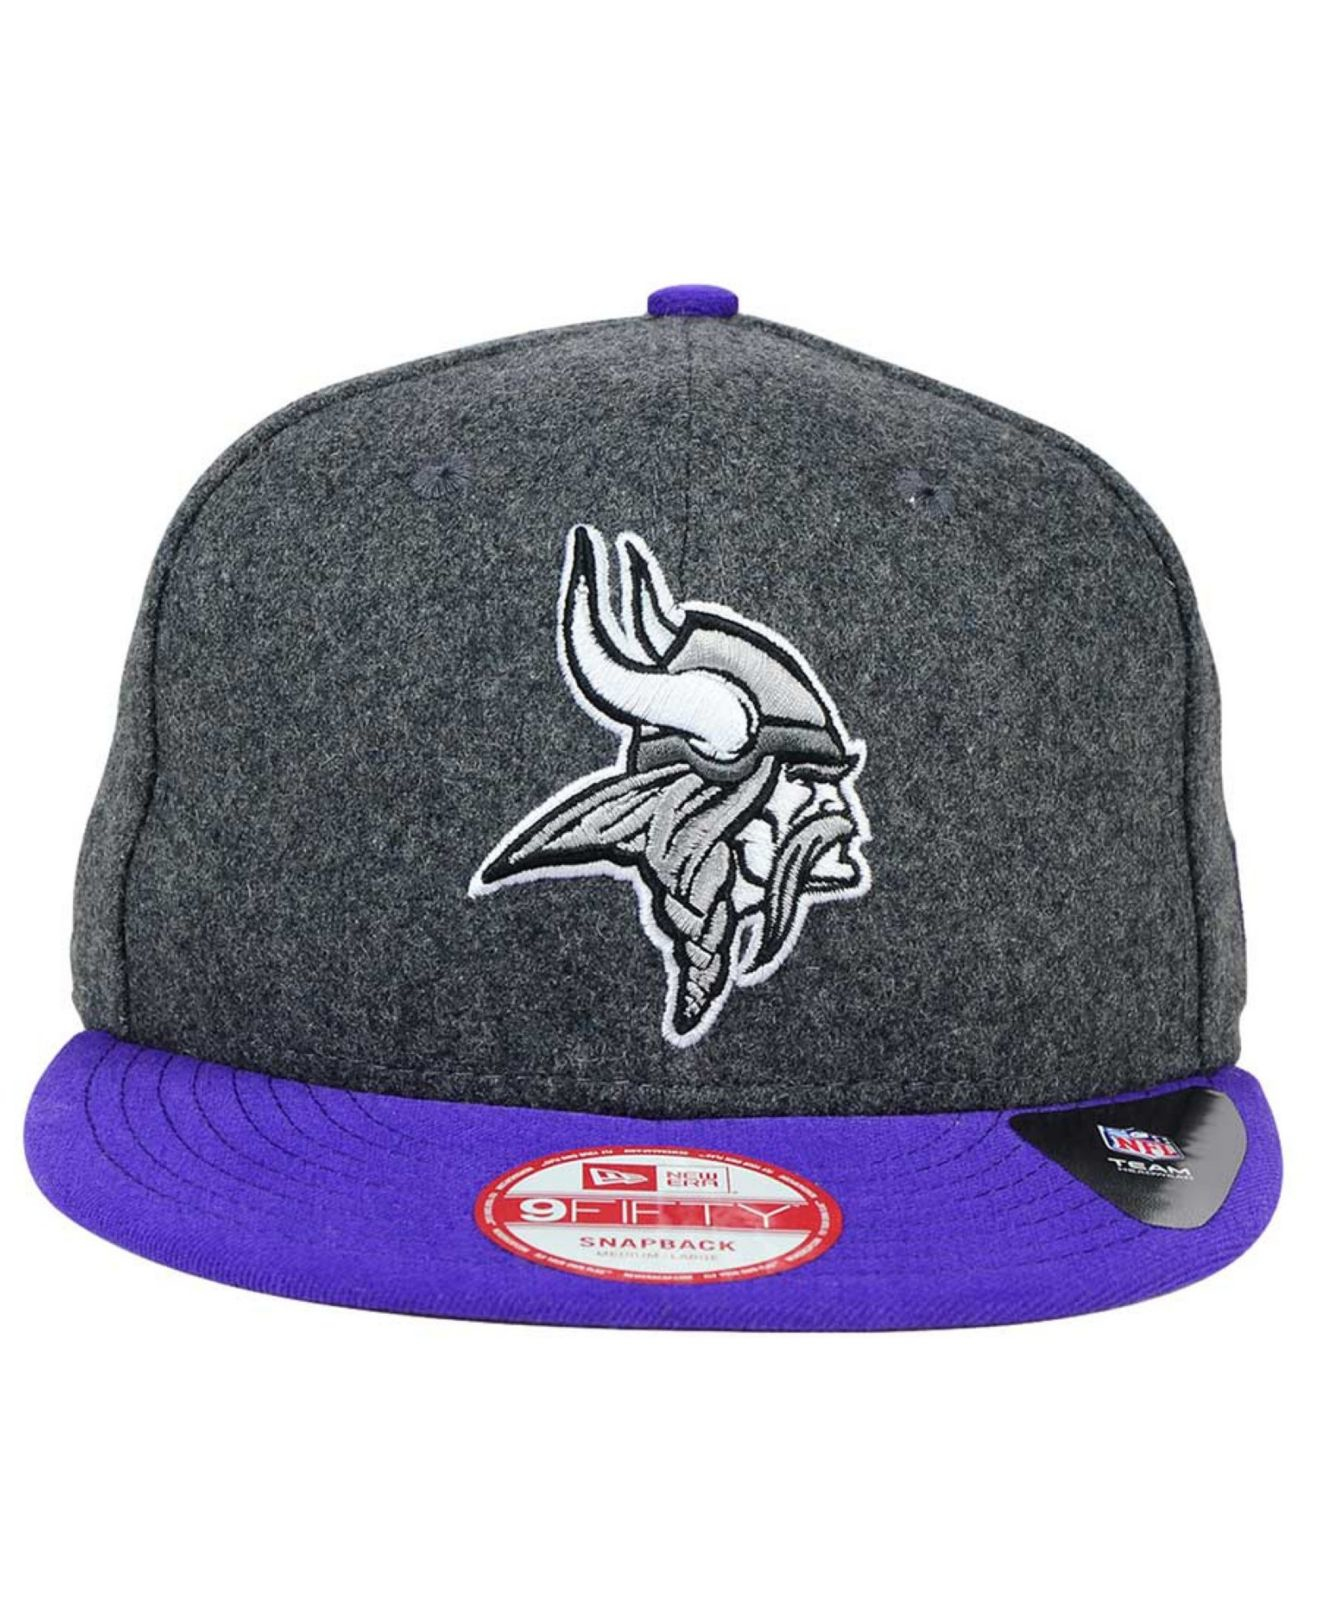 best sneakers e2144 6f151 Lyst - Ktz Minnesota Vikings Shader Melt 9fifty Snapback Cap in Gray ...